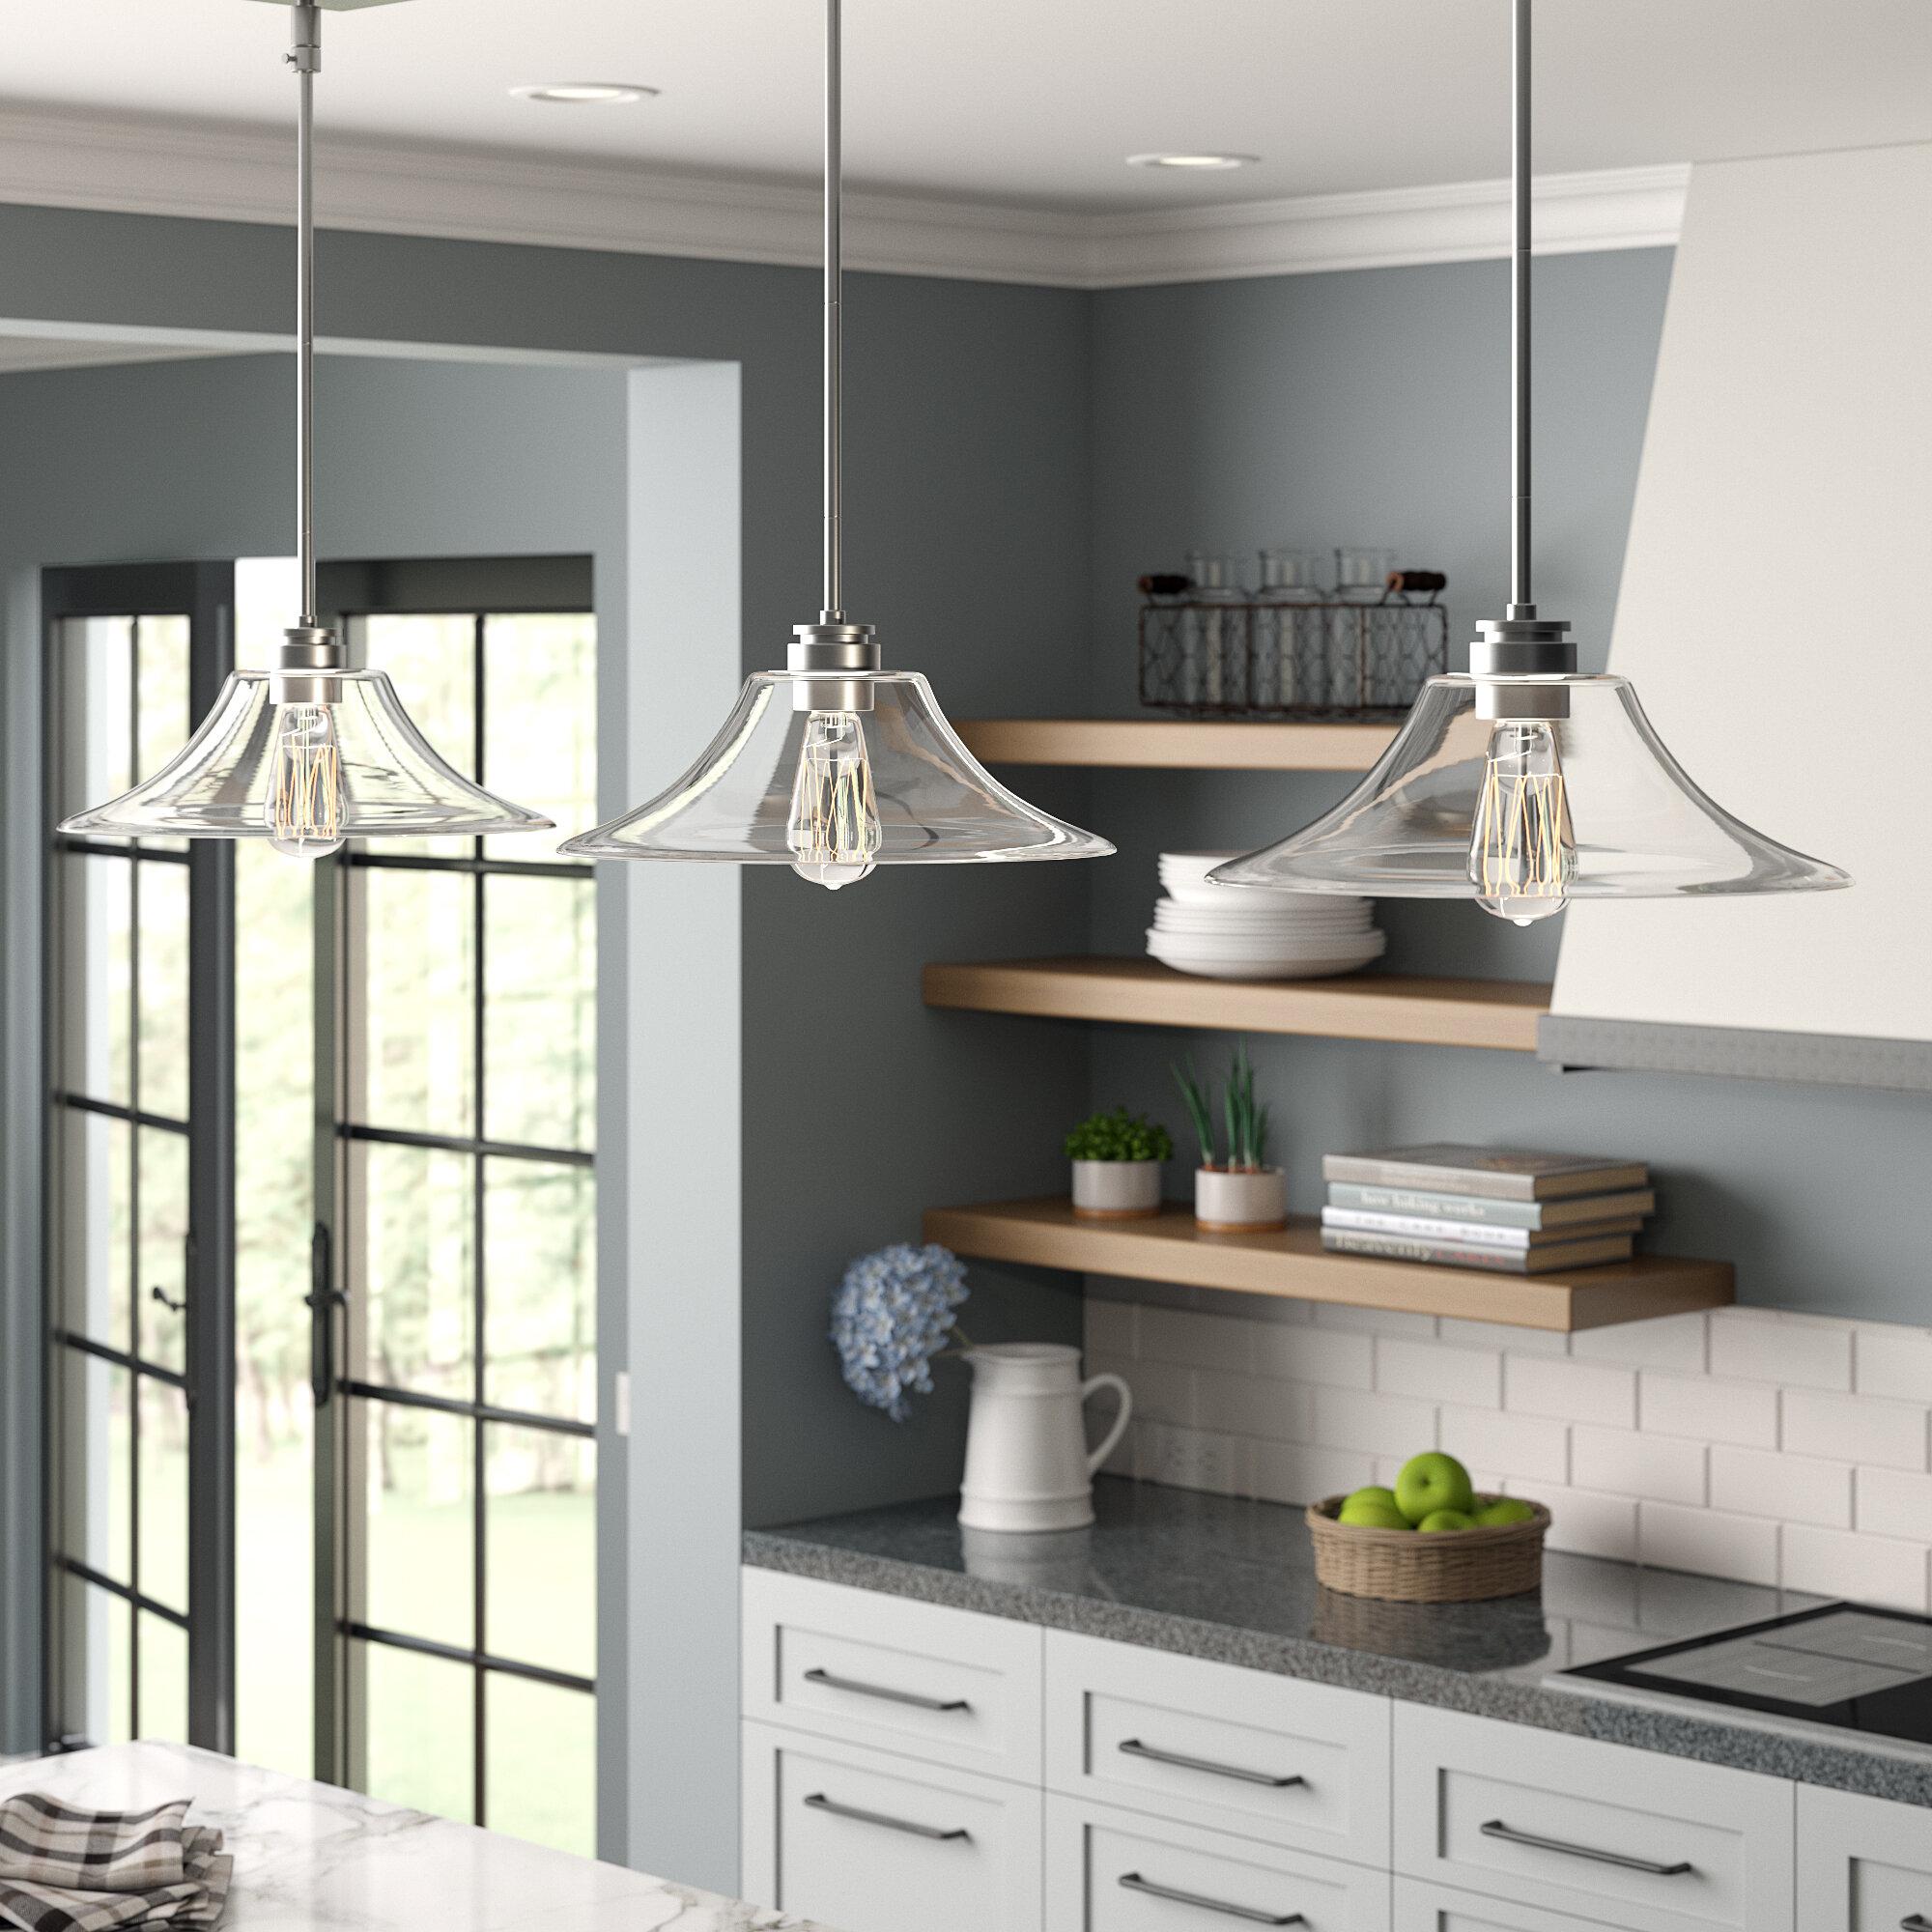 Laurel Foundry Modern Farmhouse Clayton 3 Light Kitchen Island Linear Pendant Reviews Wayfair